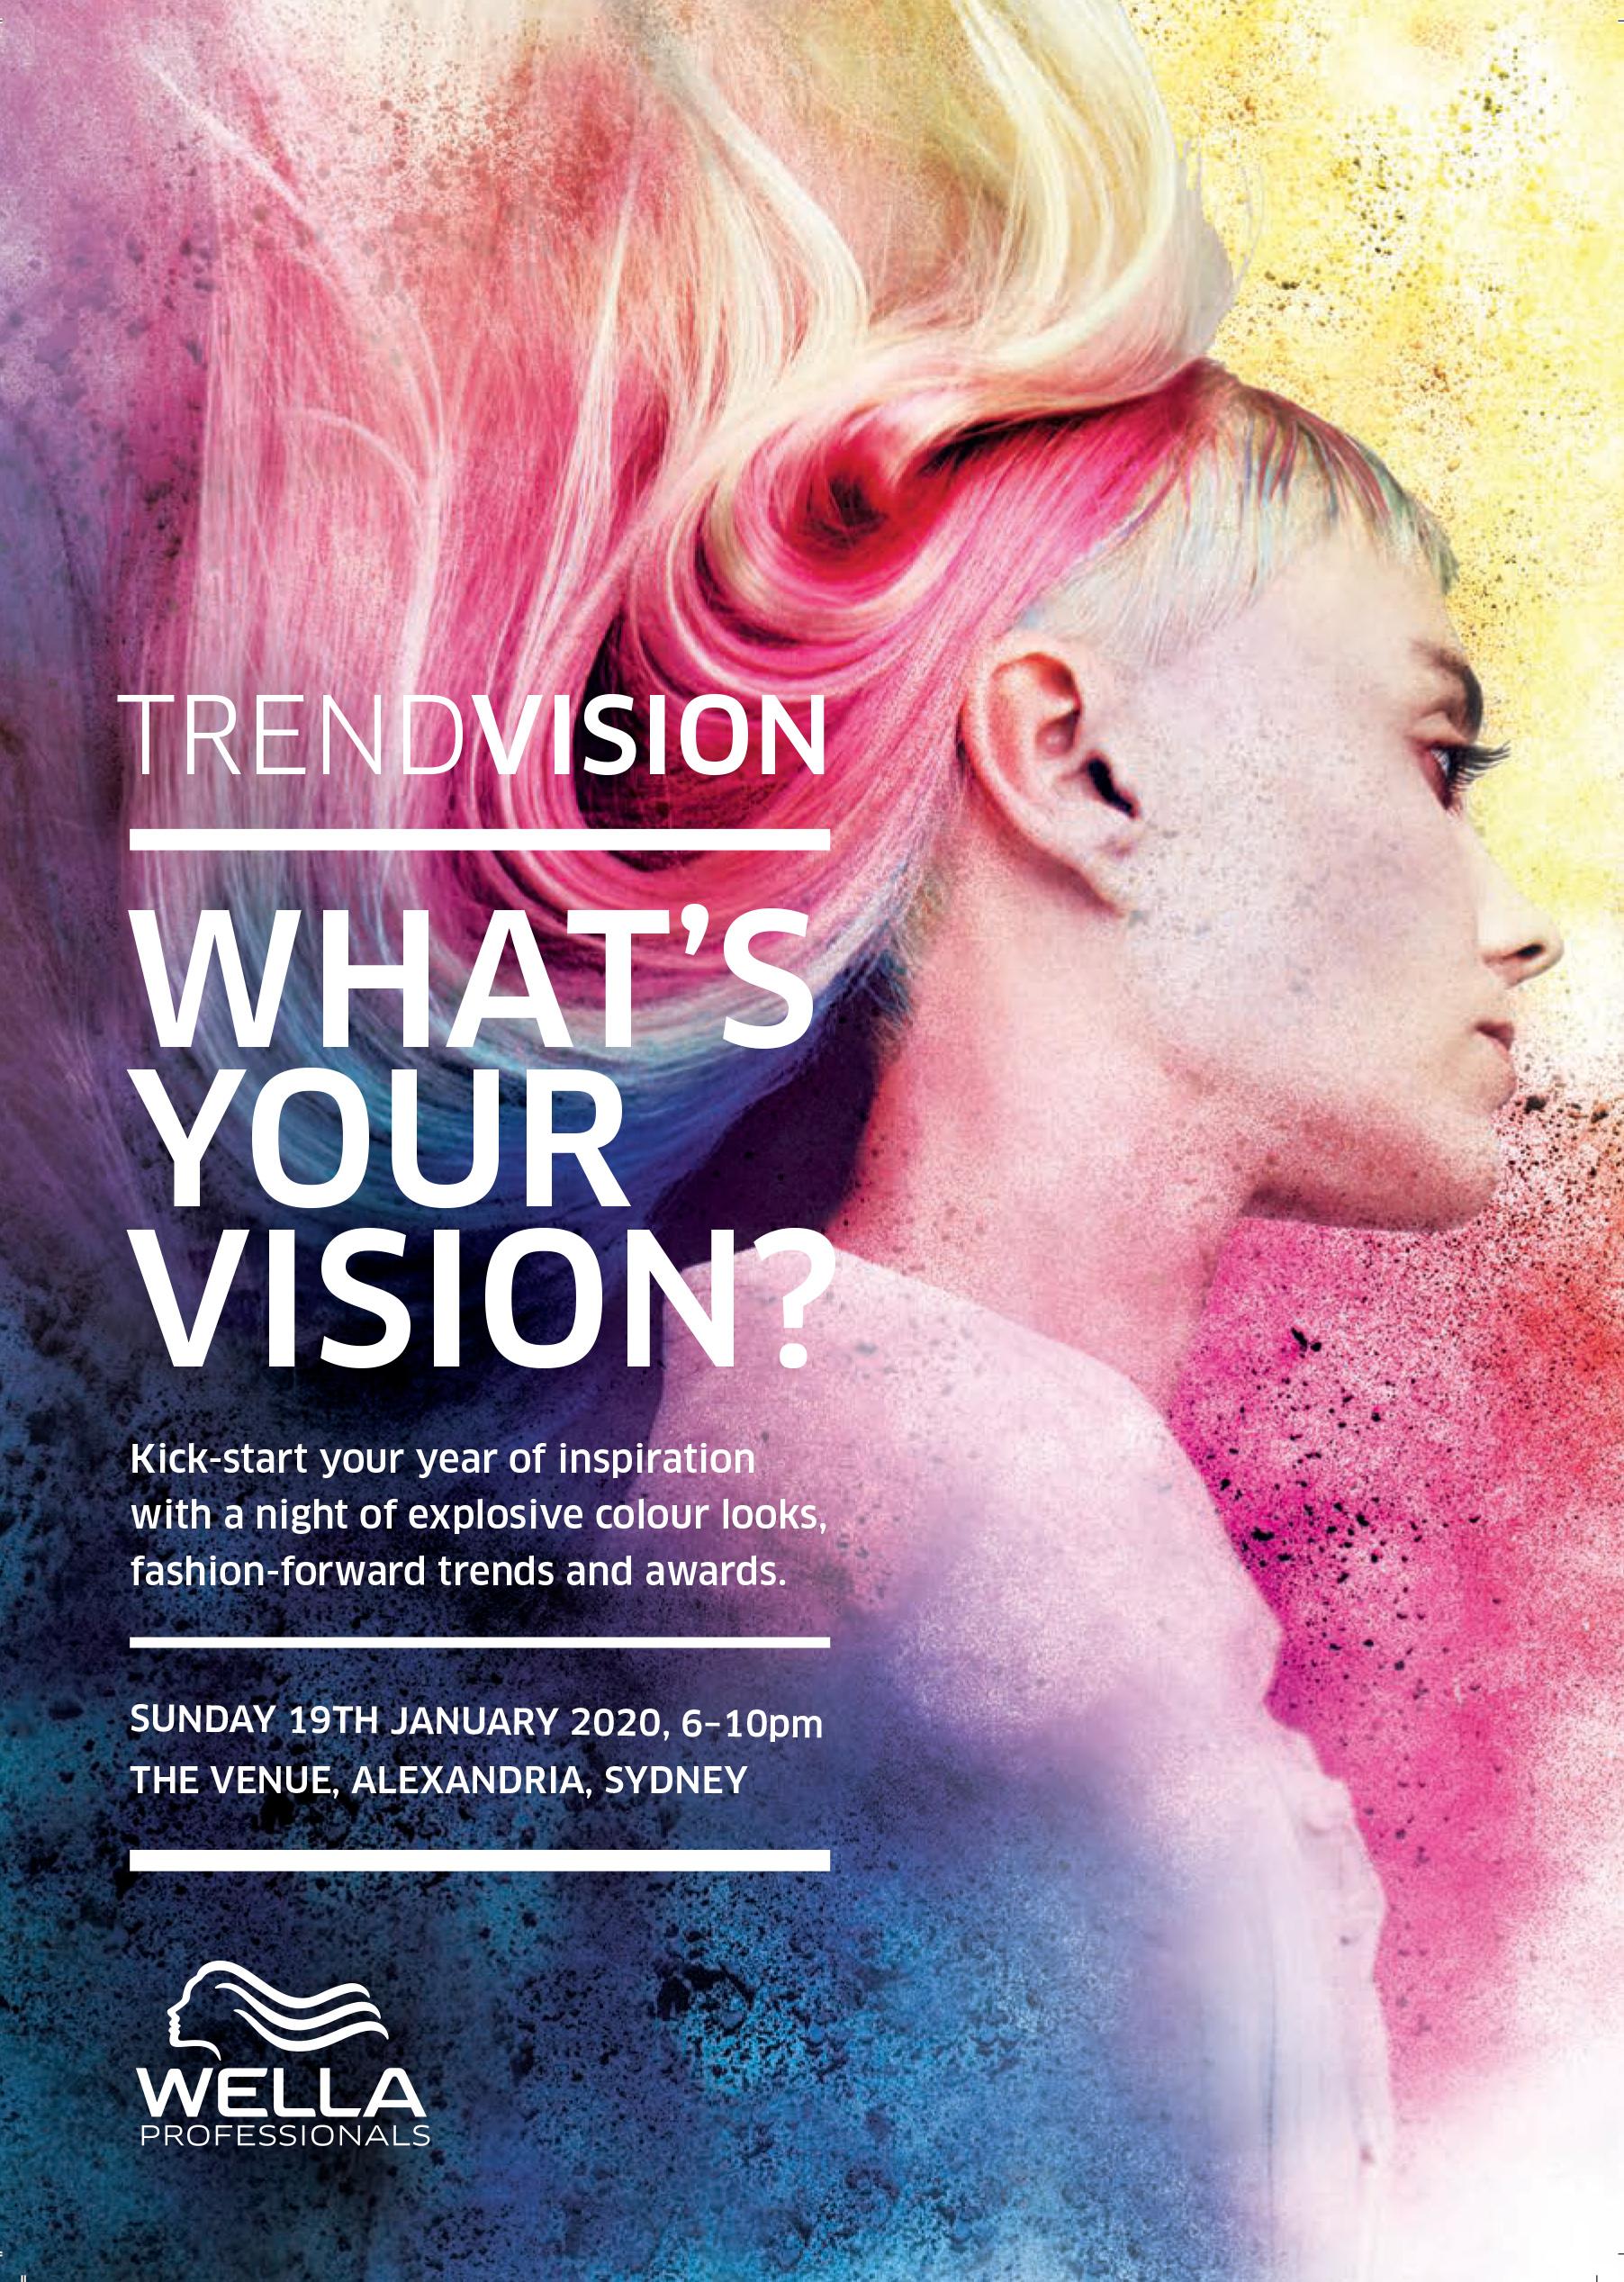 Wella-Professionals, Wella-Trend-Vision